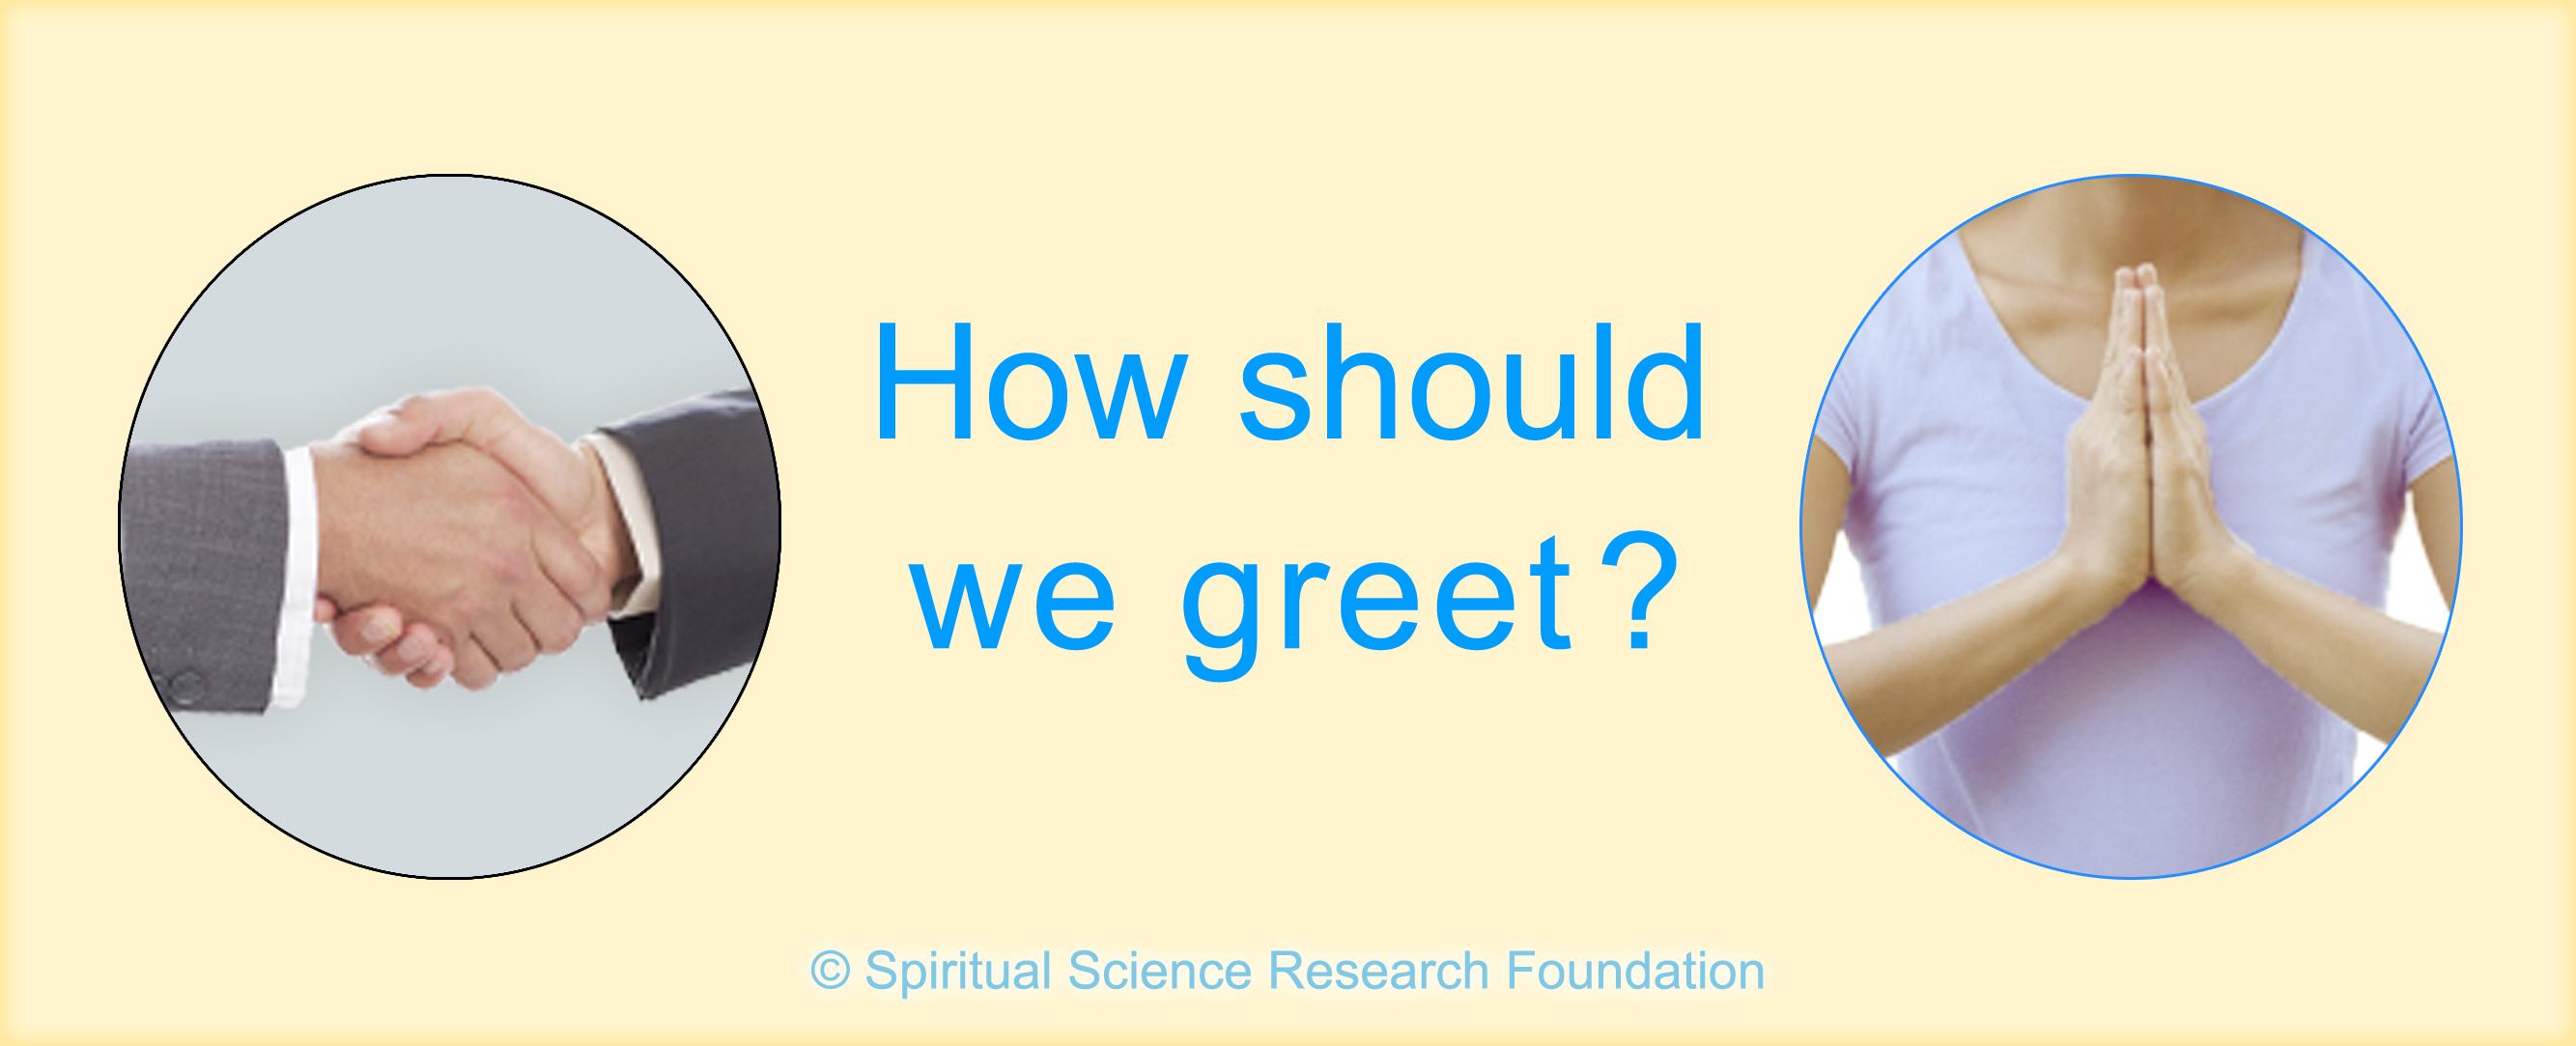 How should we greet